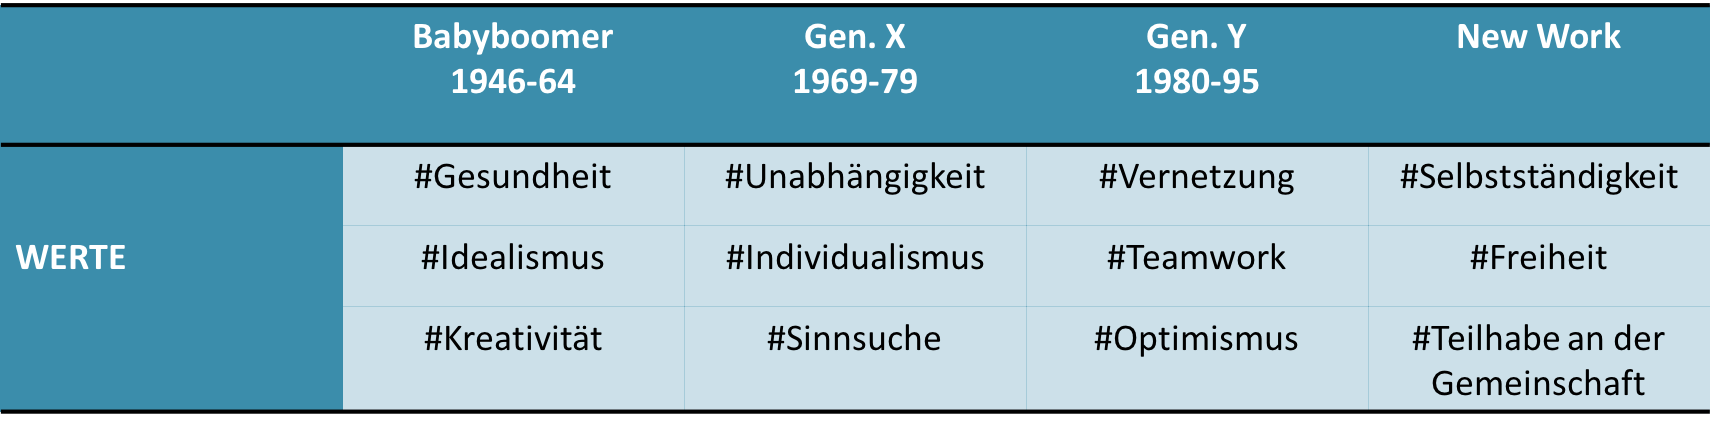 Werte-Tabelle